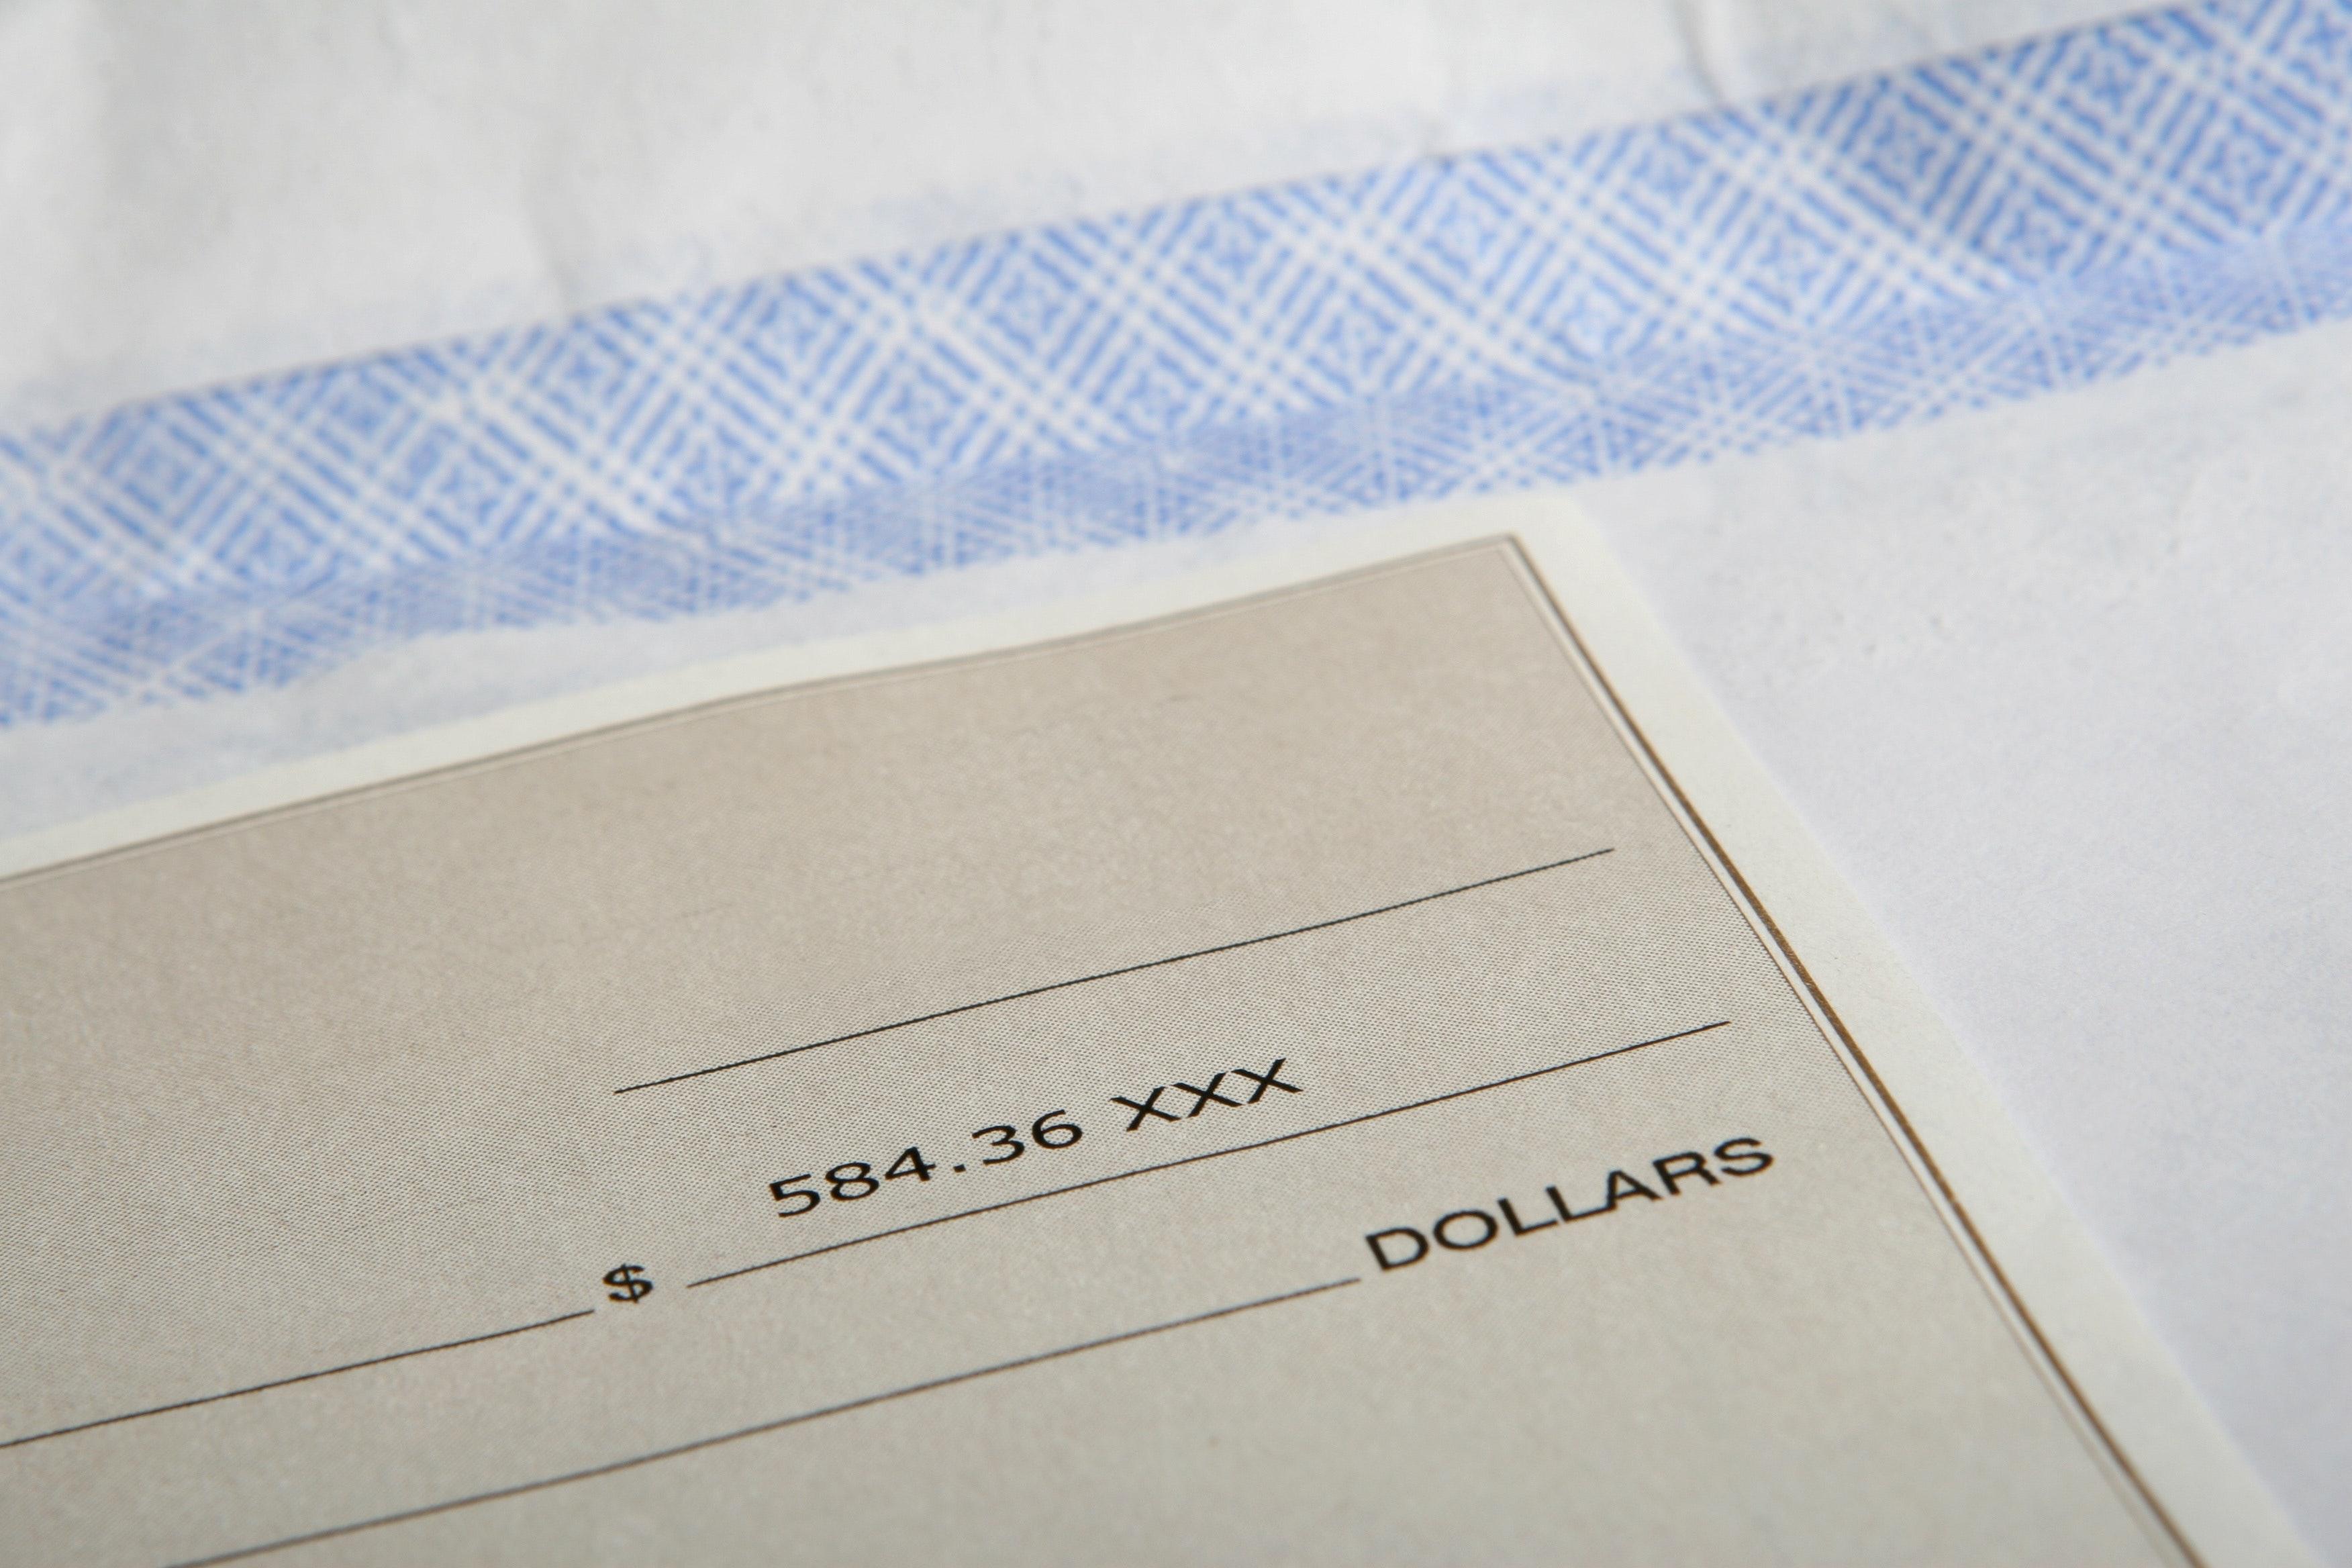 check-cheque-commerce-259130